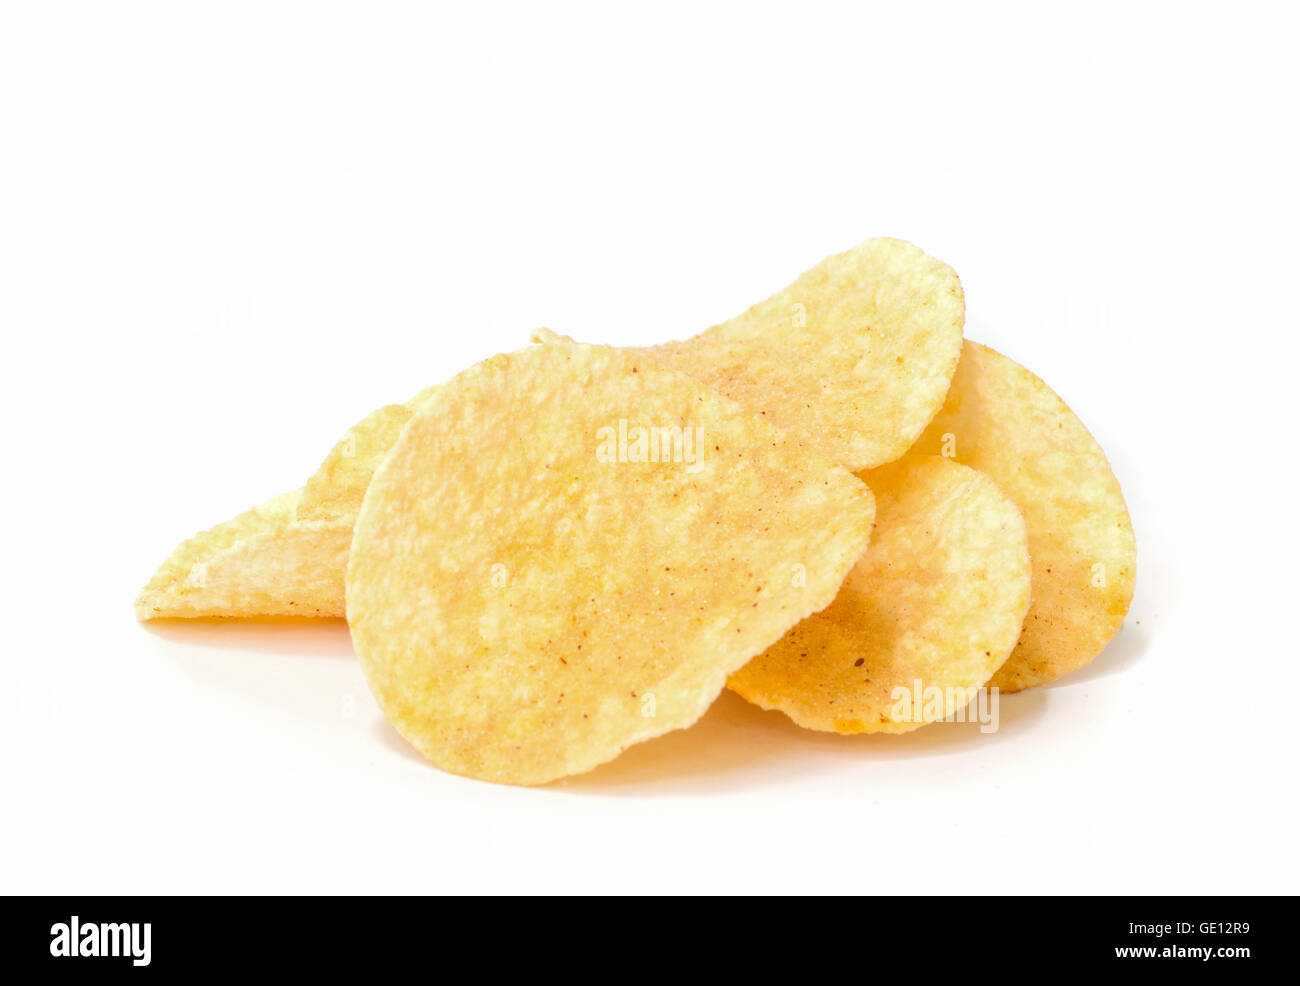 crunchy potato chips on white background. - Stock Image